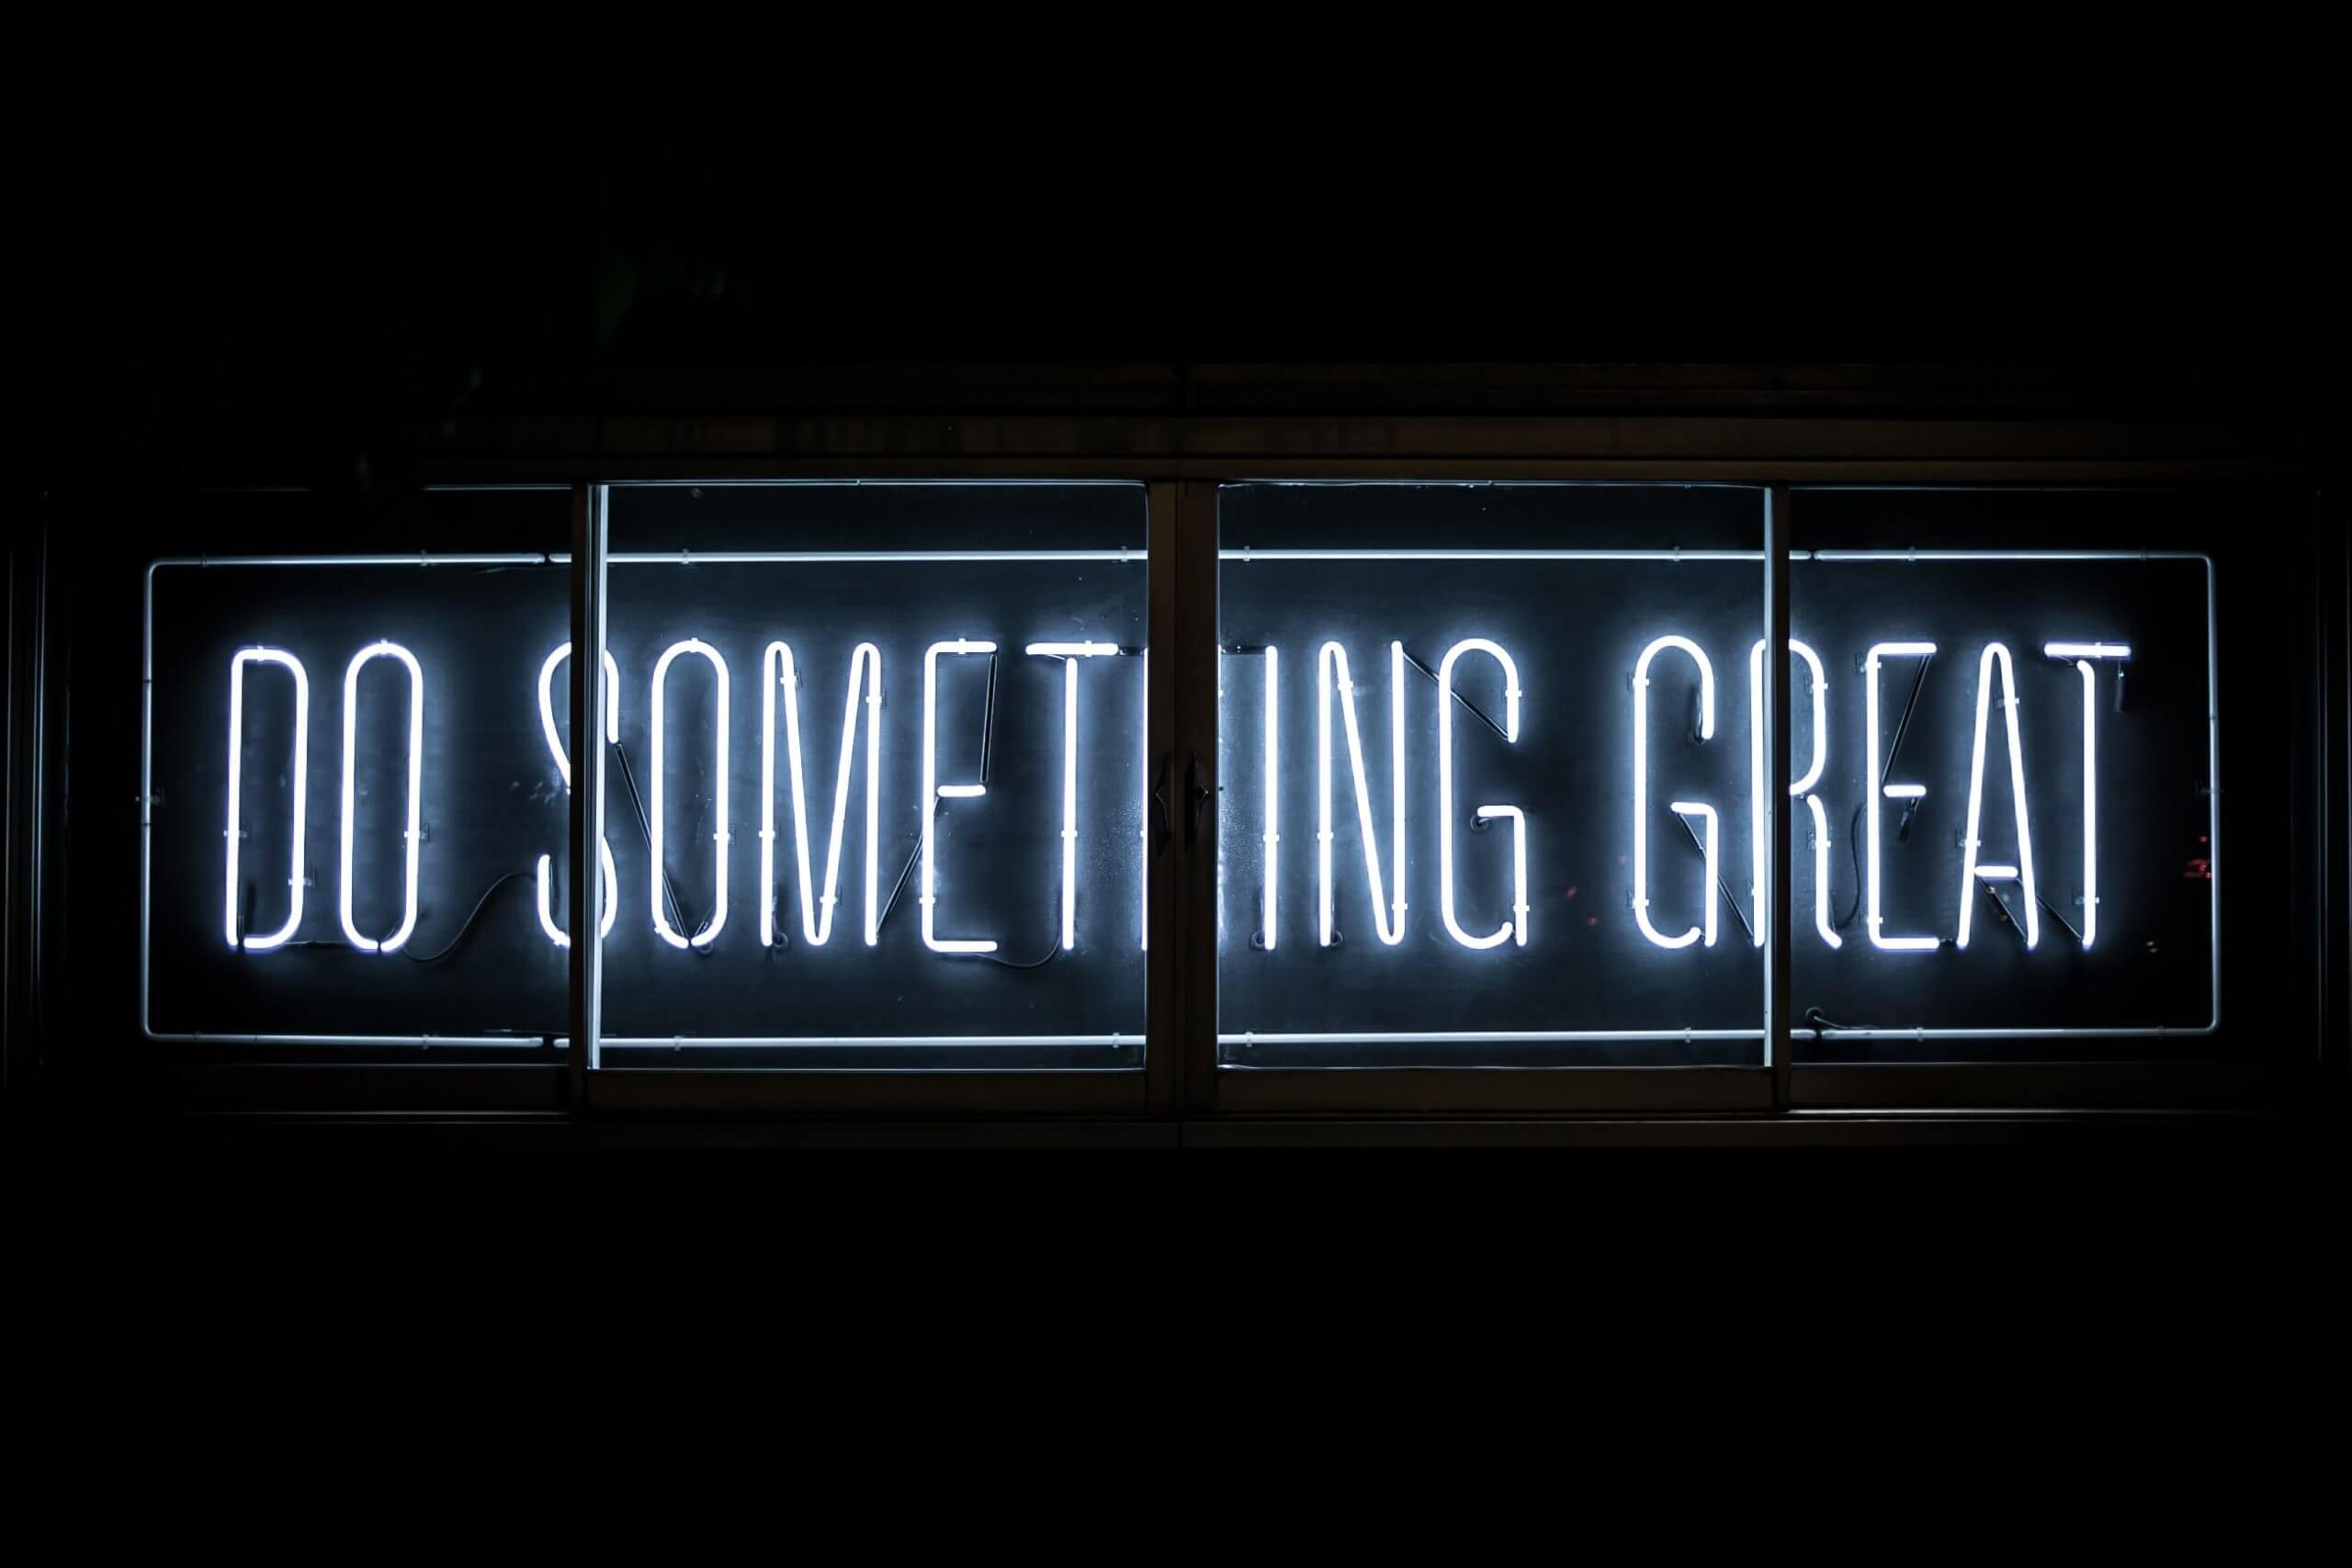 Neon sign saying 'Do something great'